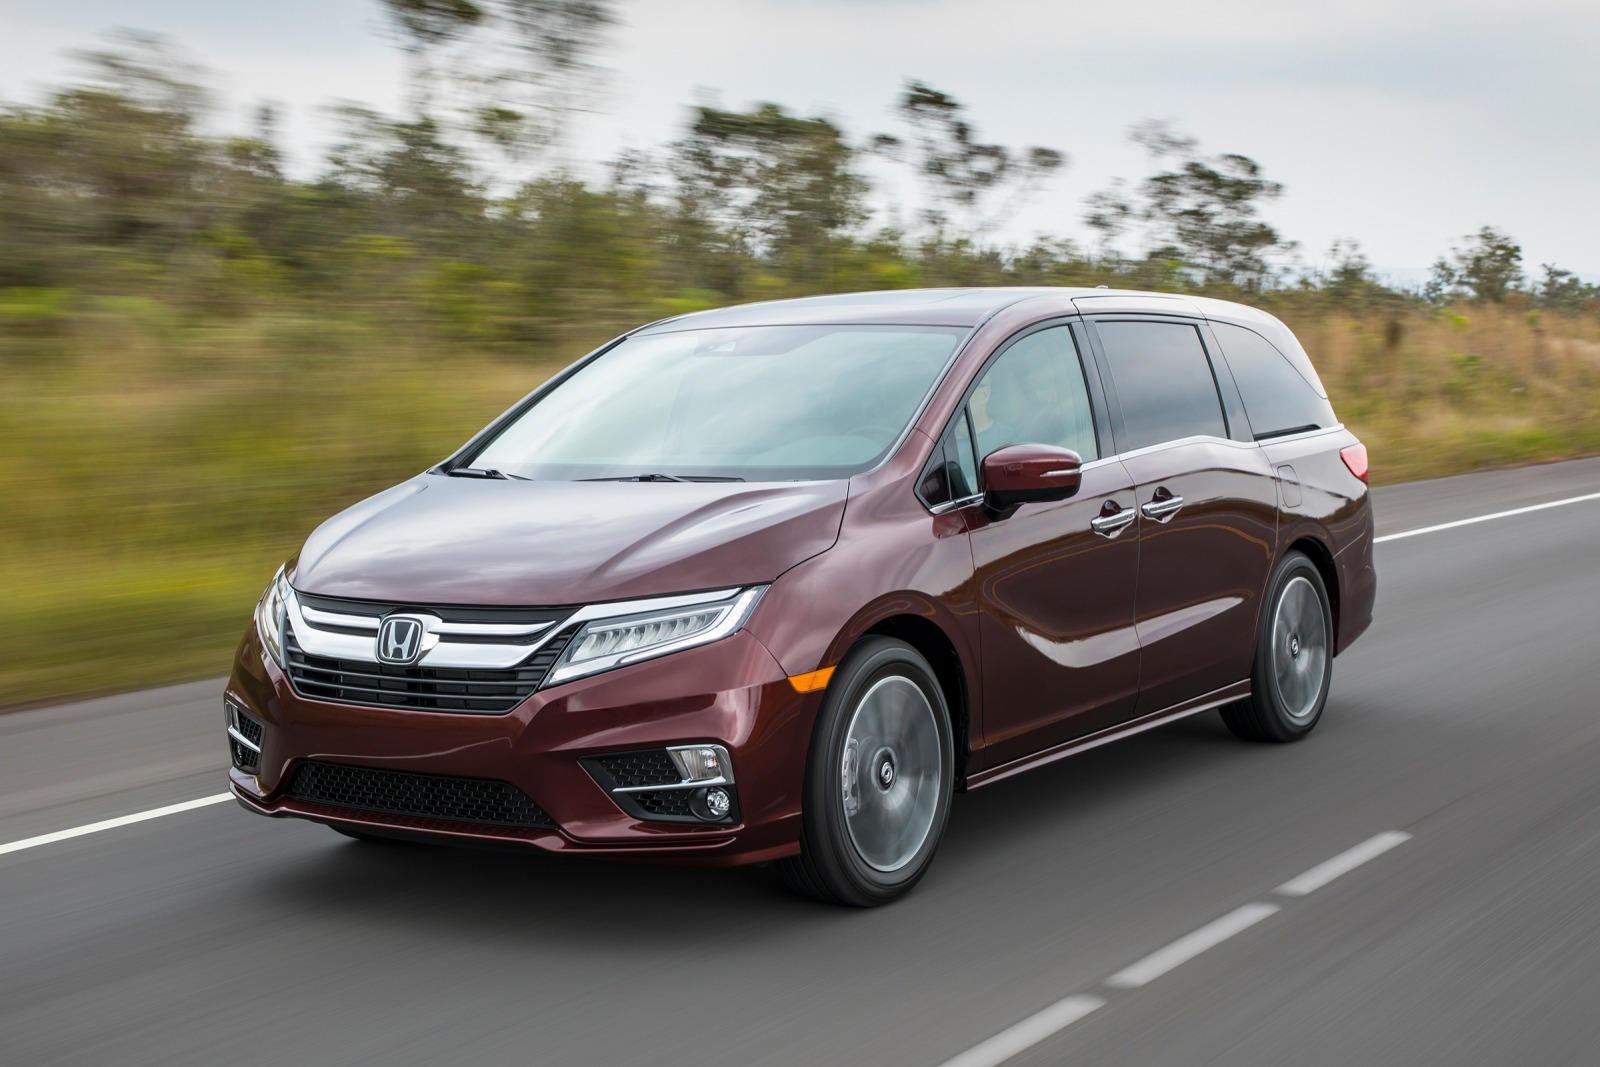 2020 Honda Odyssey: Review, Trims, Specs, Price, New ...